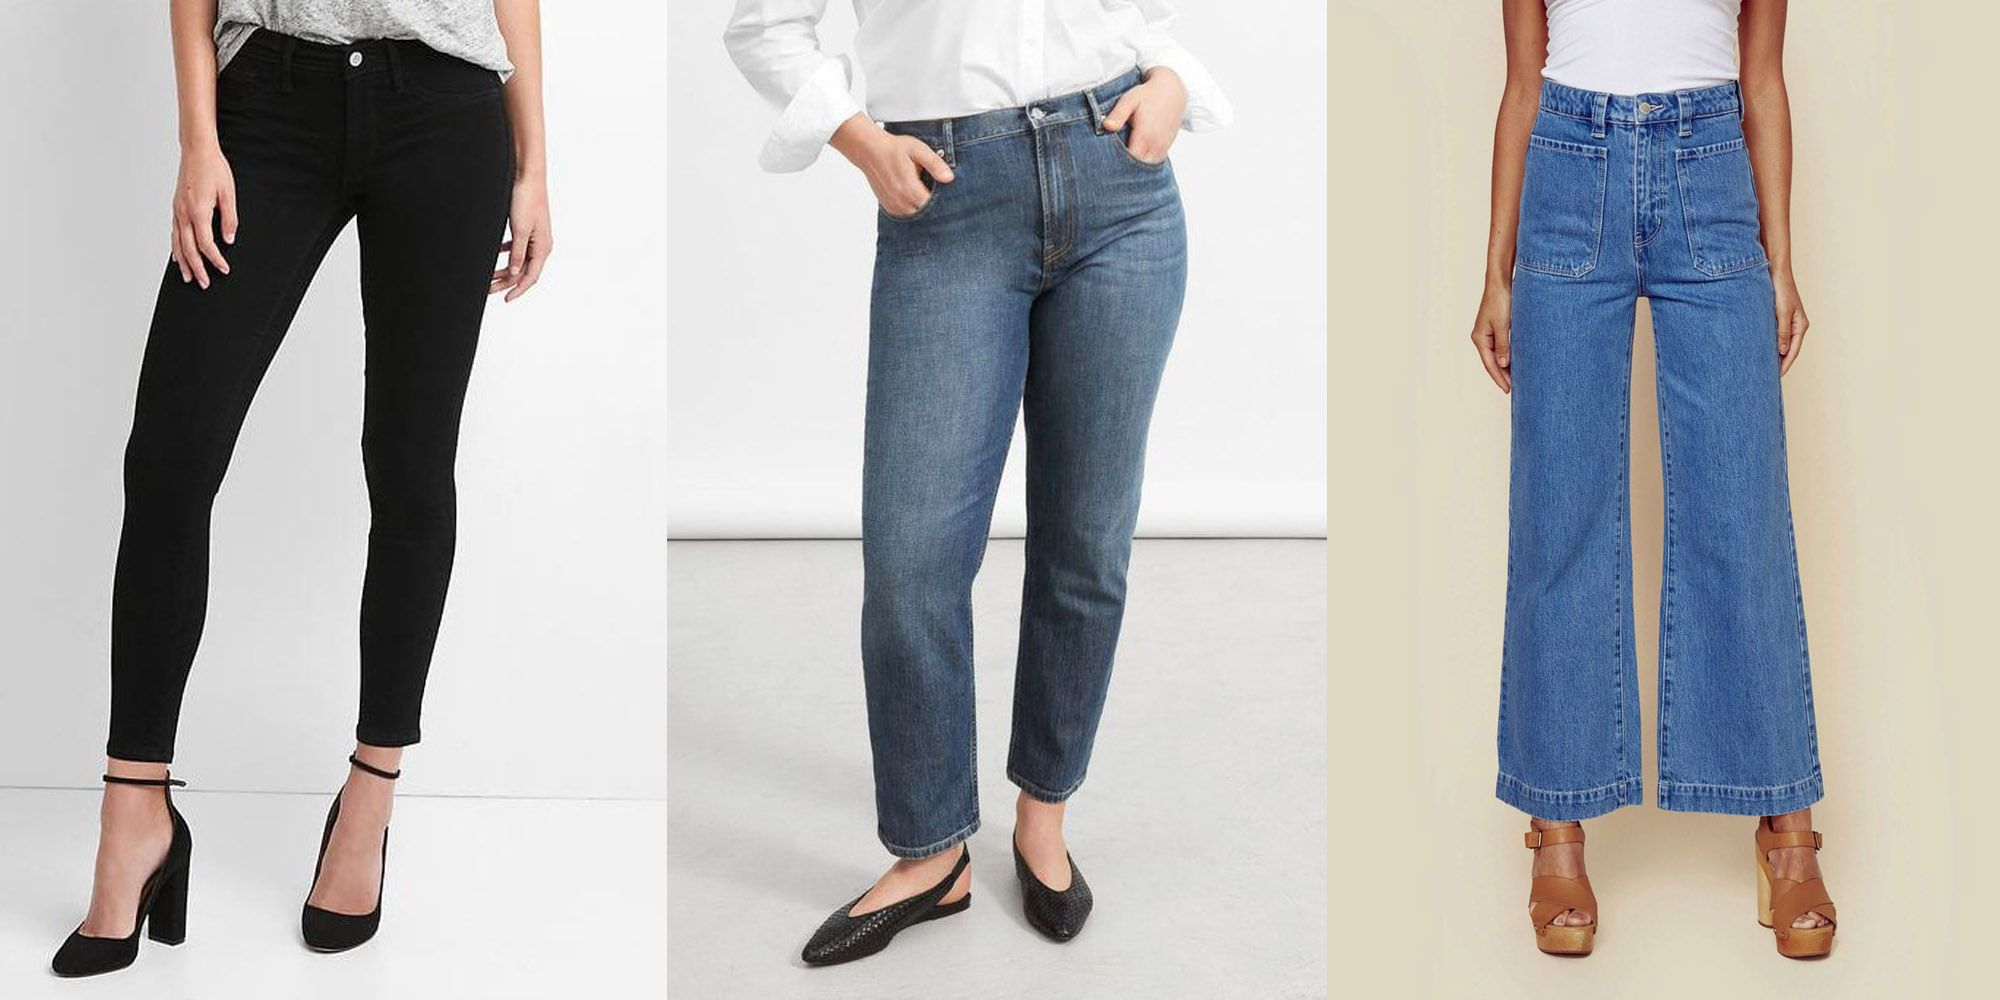 f99d1de51a63 20 of the Best Women s Jeans in Every Style — Best Denim Jeans for Women